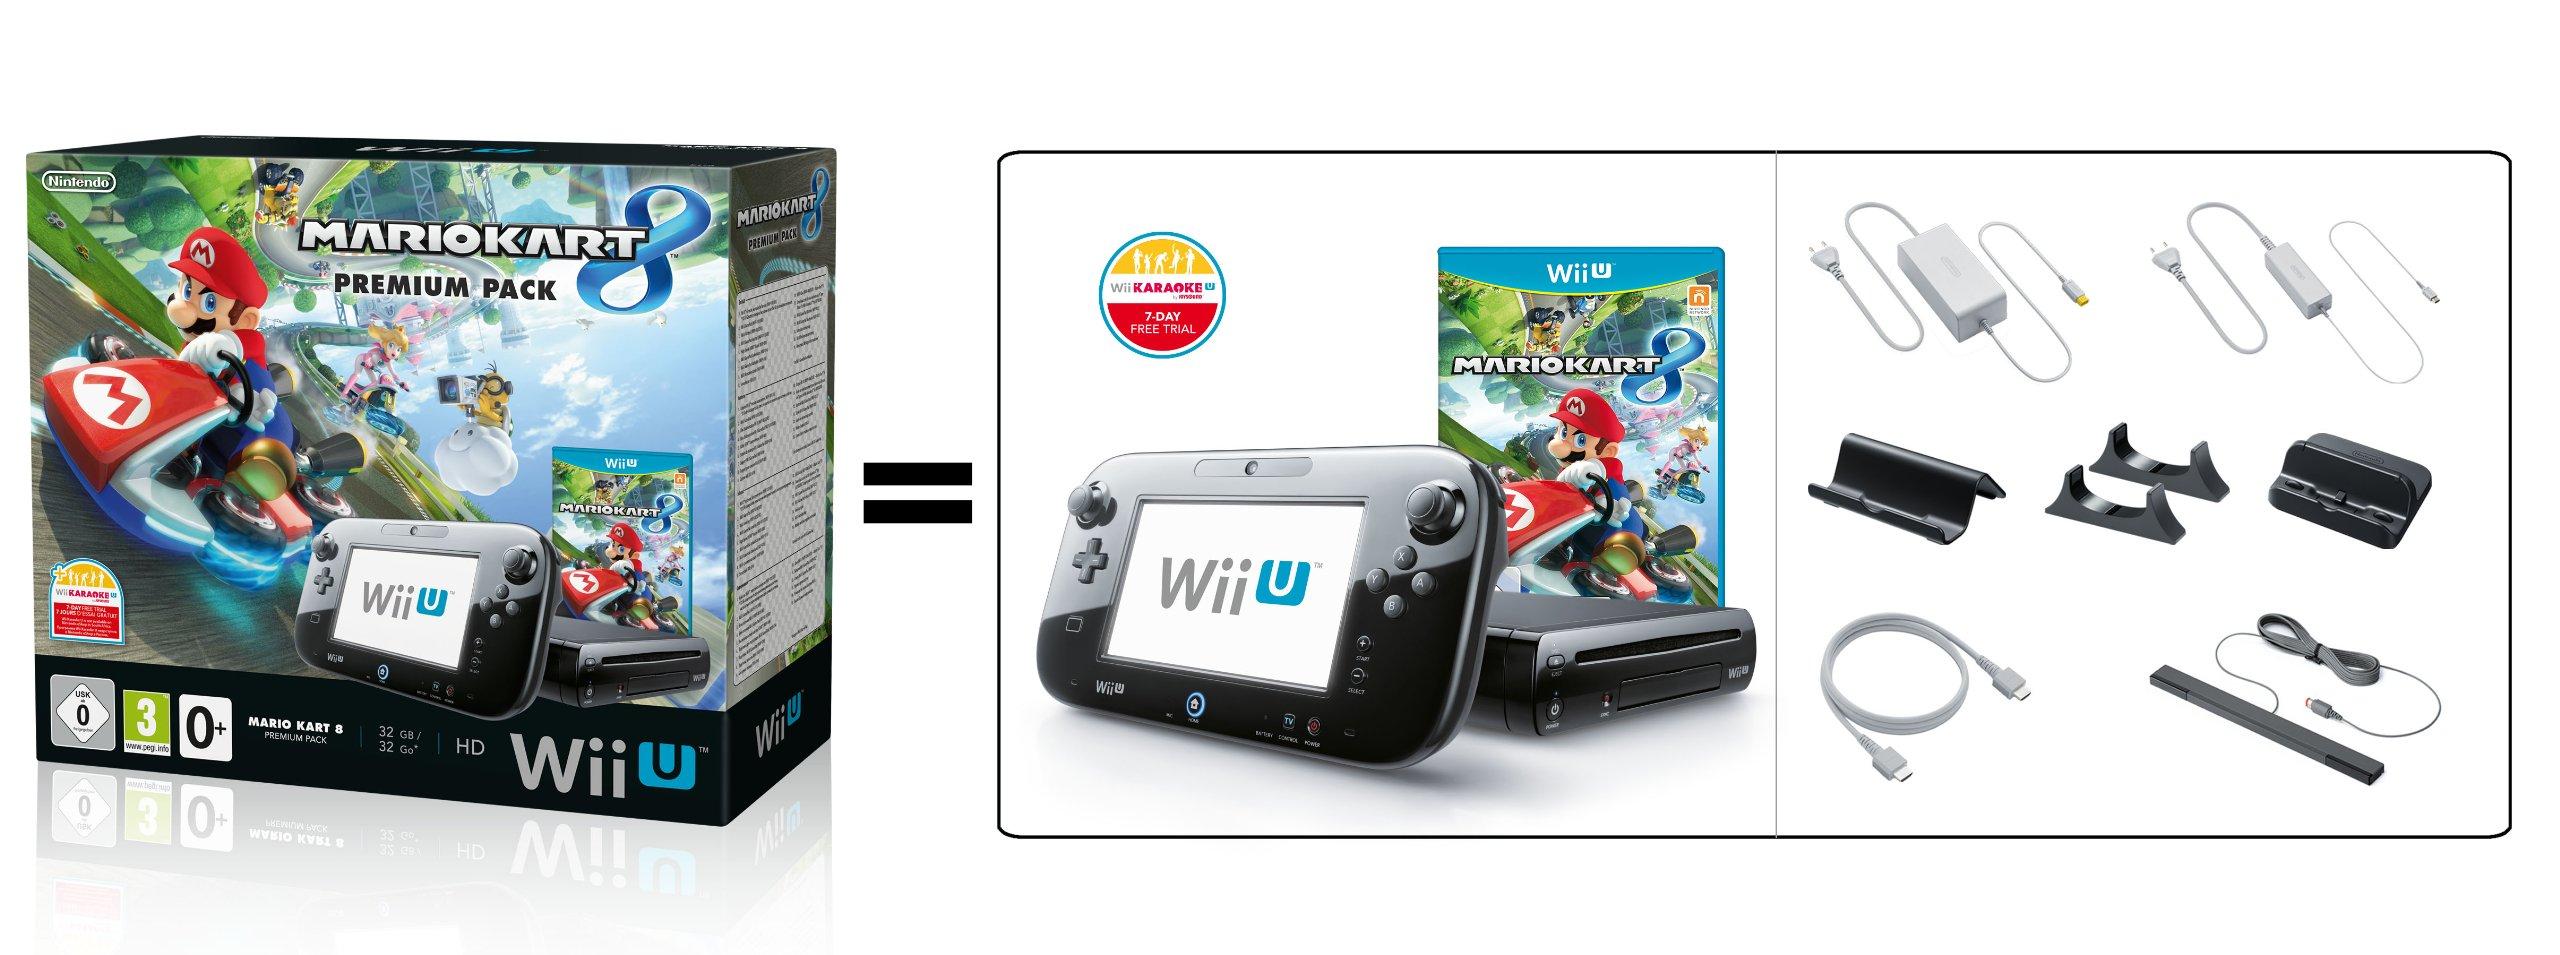 Nintendo Wii U 32GB + Mario Kart 8 Premium - videoconsolas (Wii U, Negro, DDR3, LCD, IBM PowerPC, AMD Radeon): Amazon.es: Videojuegos